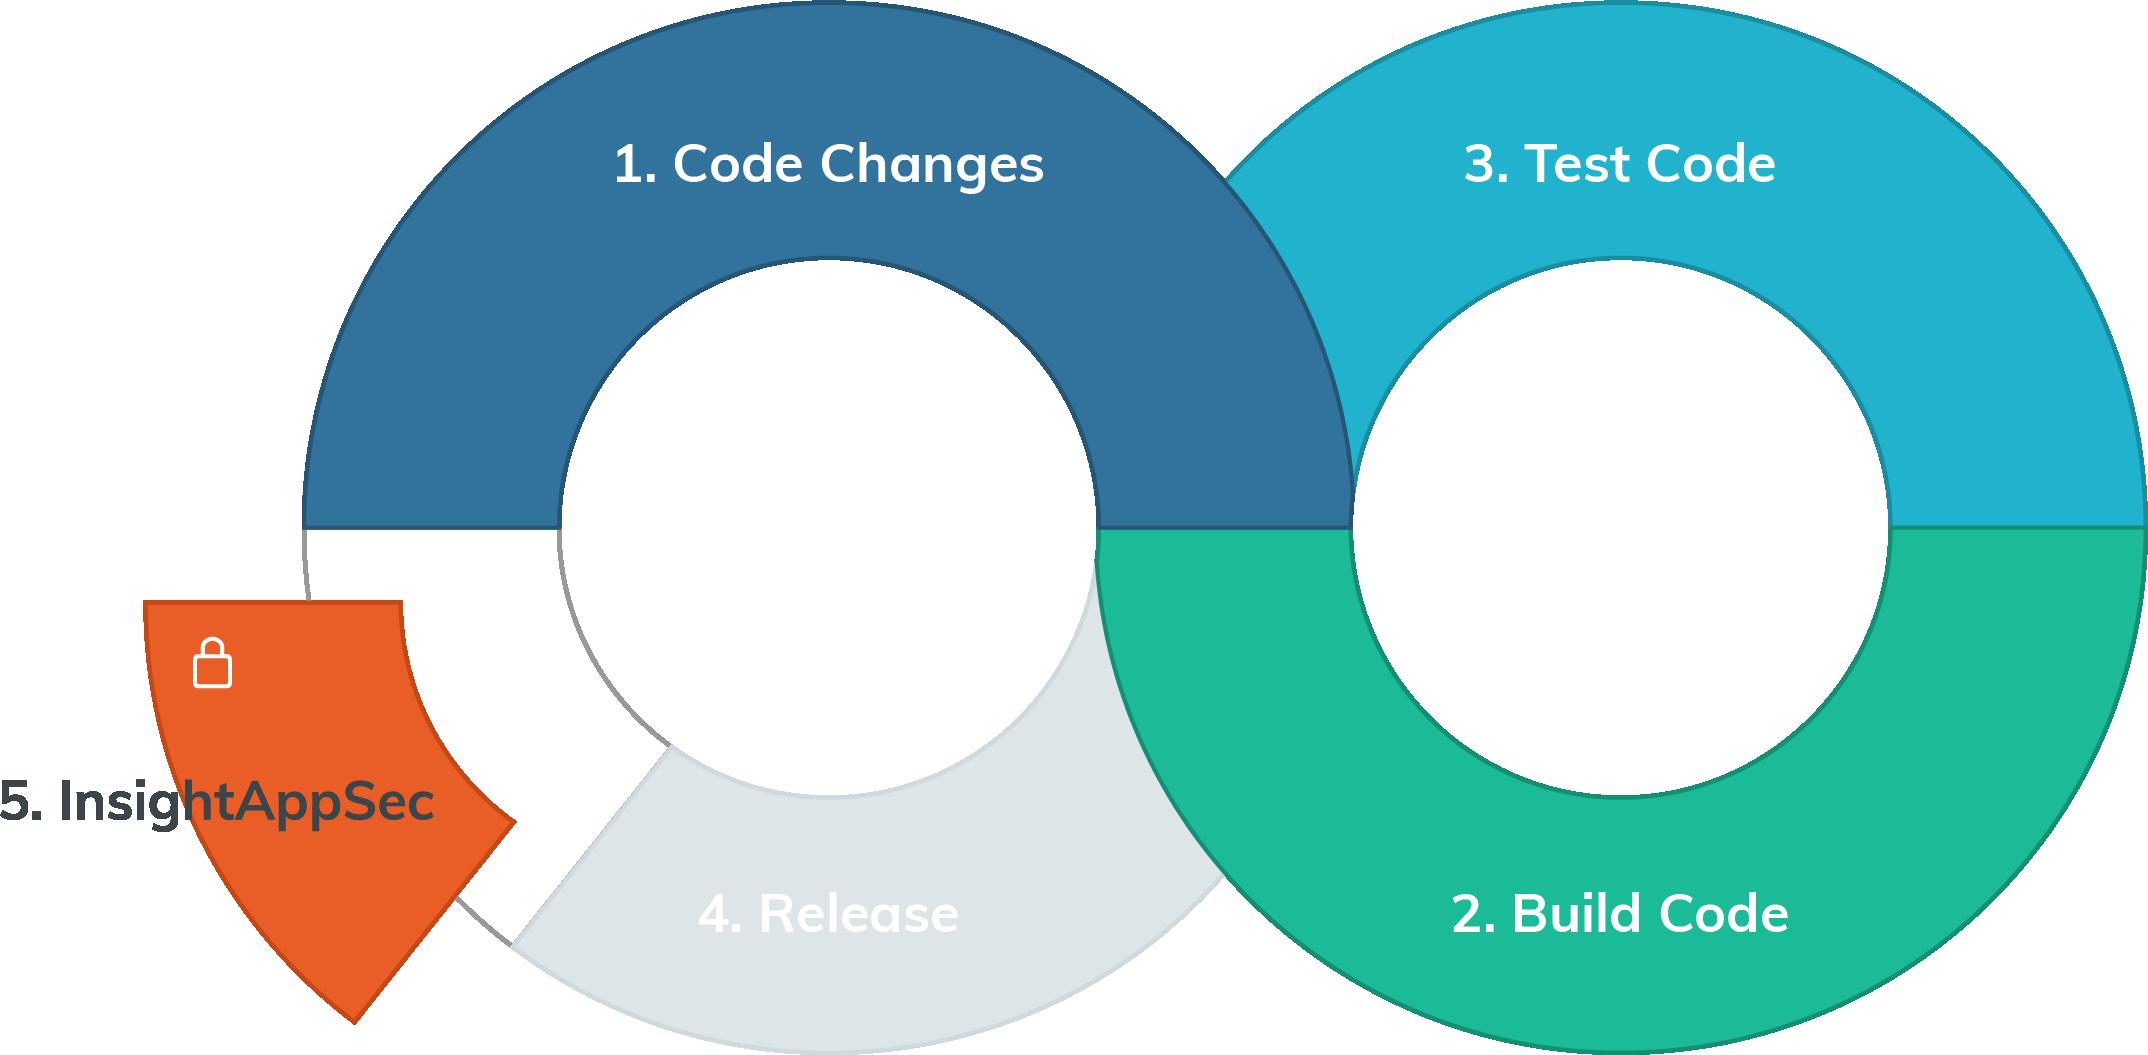 InsightAppSec-Azure-DevOps-Blog-Post-graphic